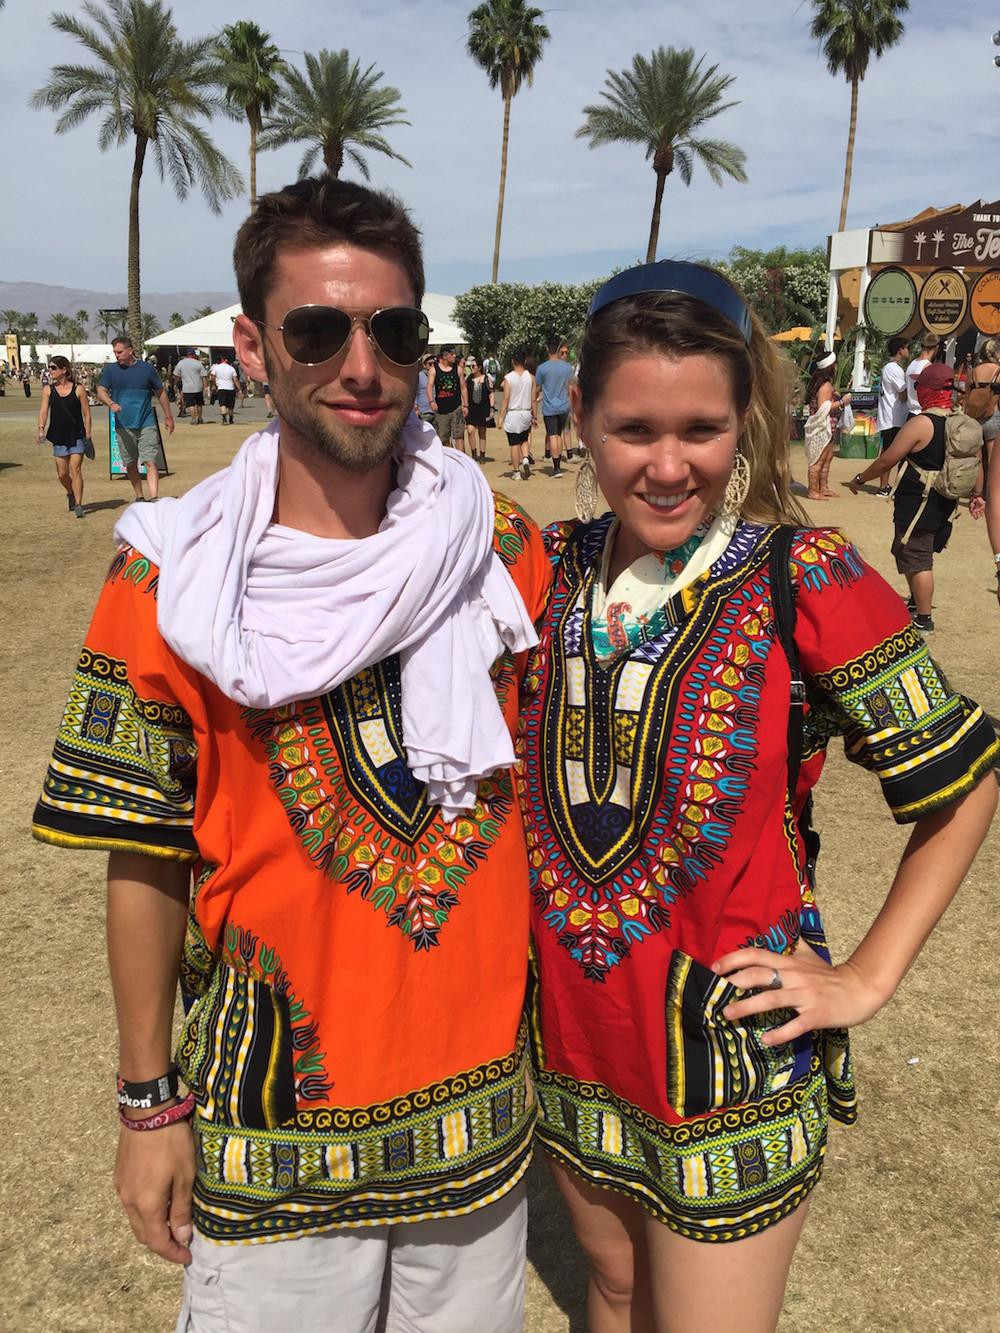 Cultural appropriation at Coachella